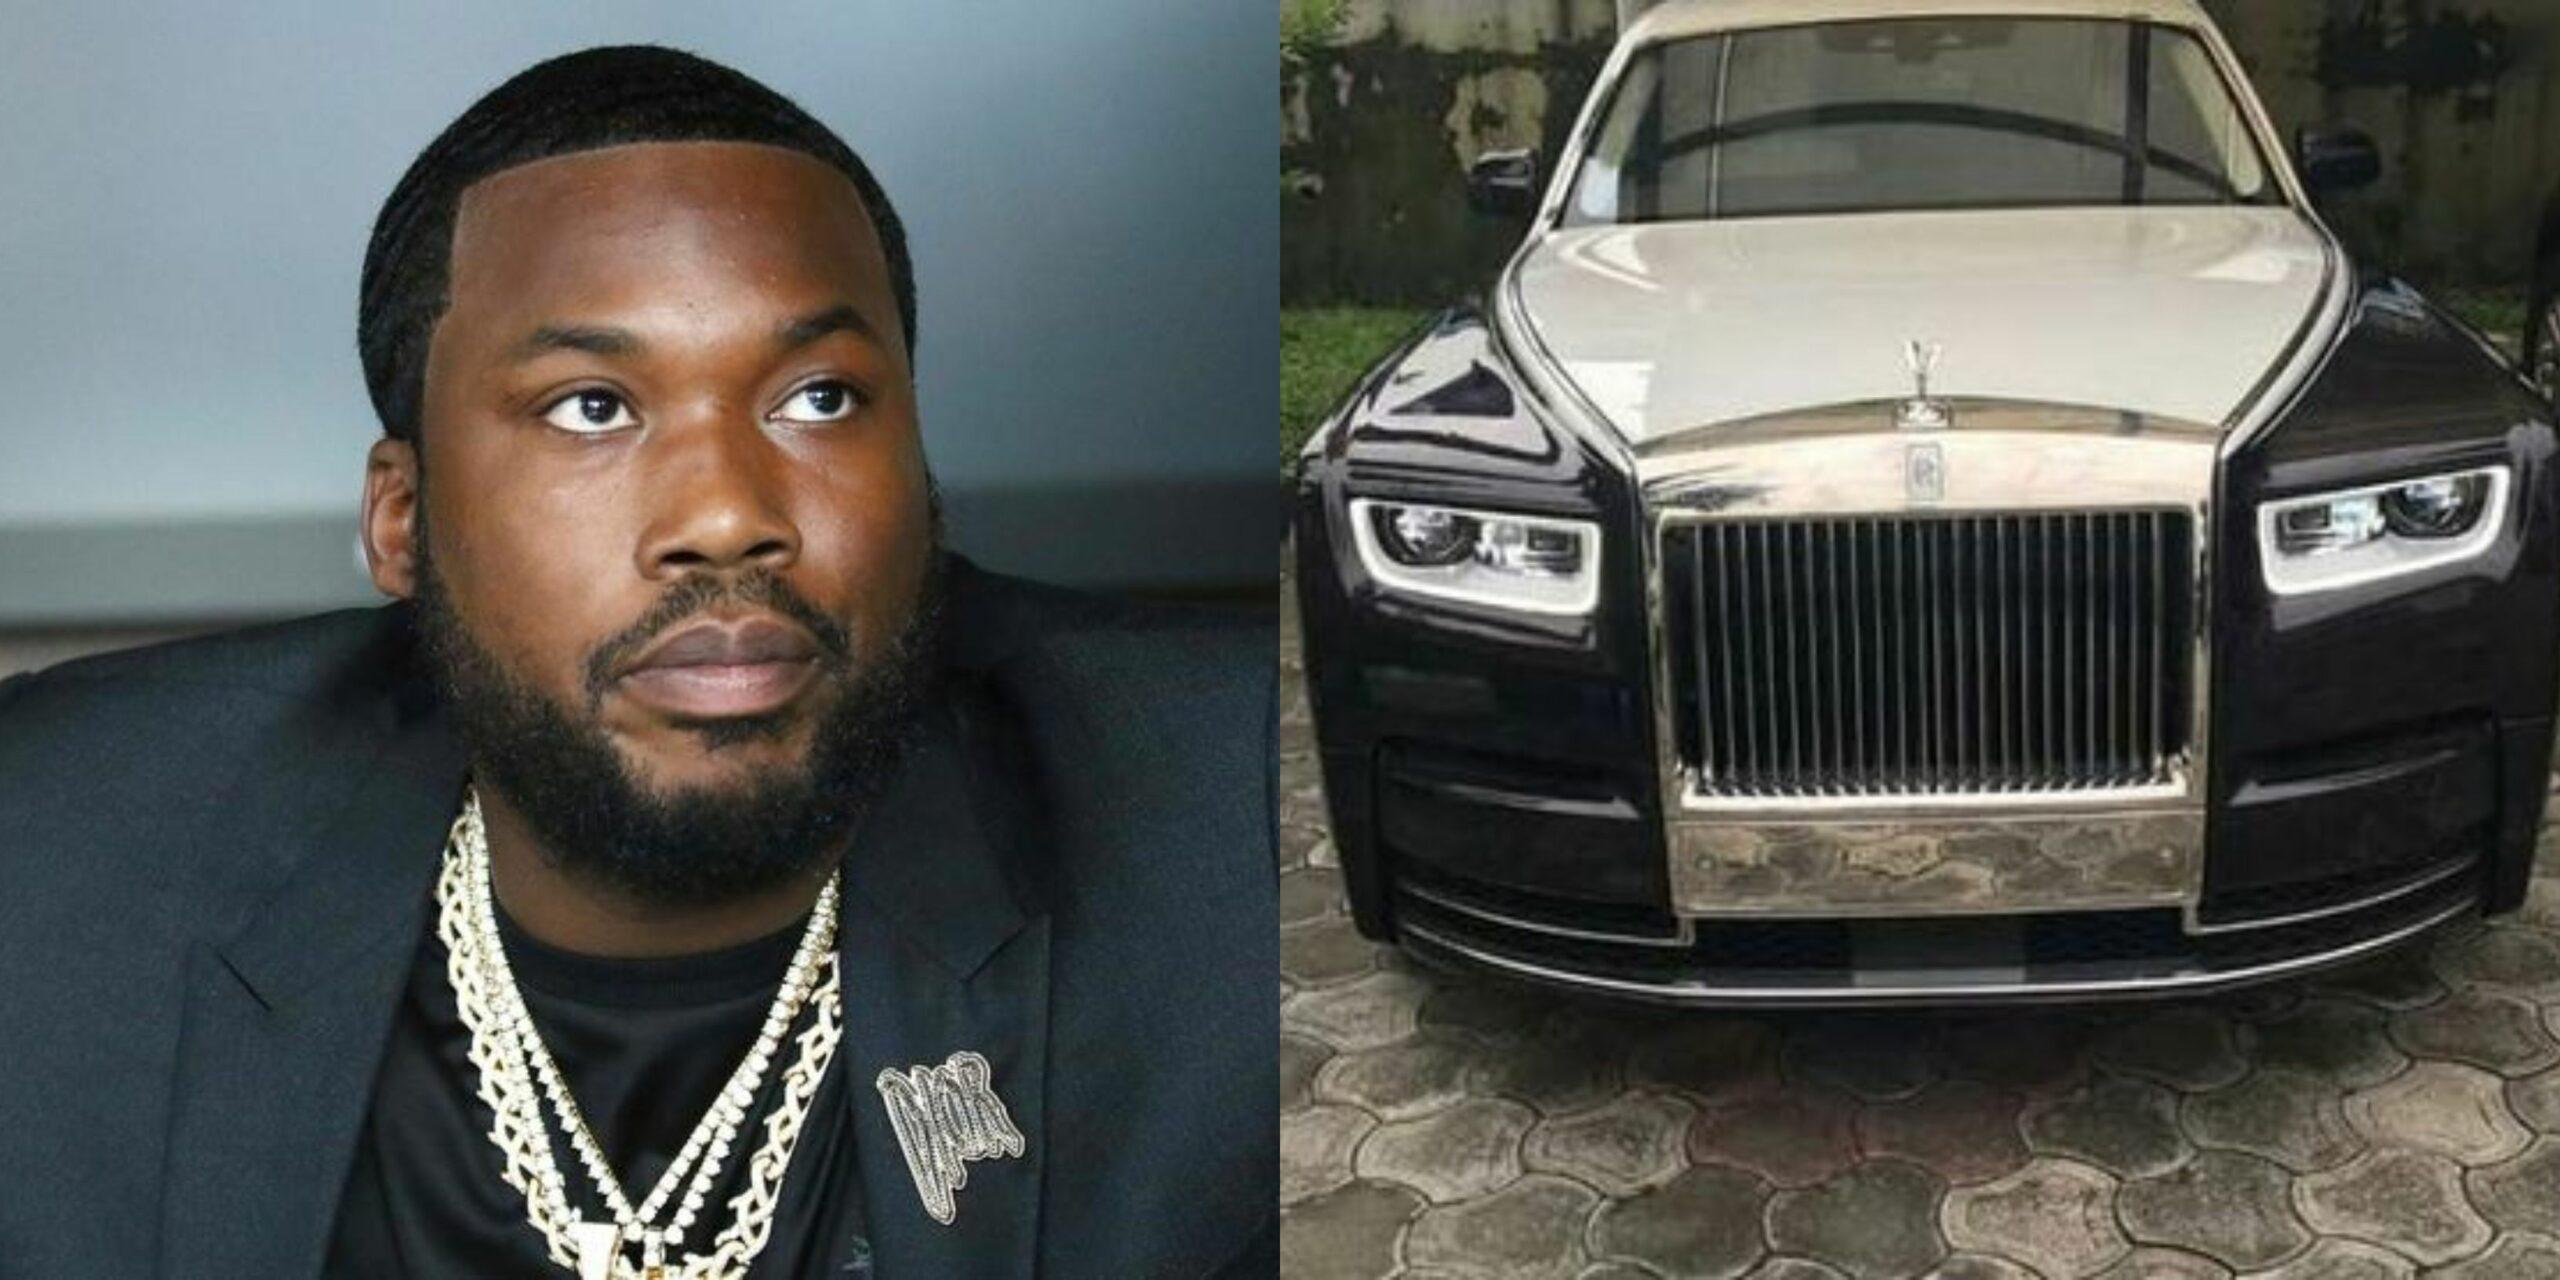 Meek Mill donates his prized Rolls Royce Phantom for COVID-19 fundraiser